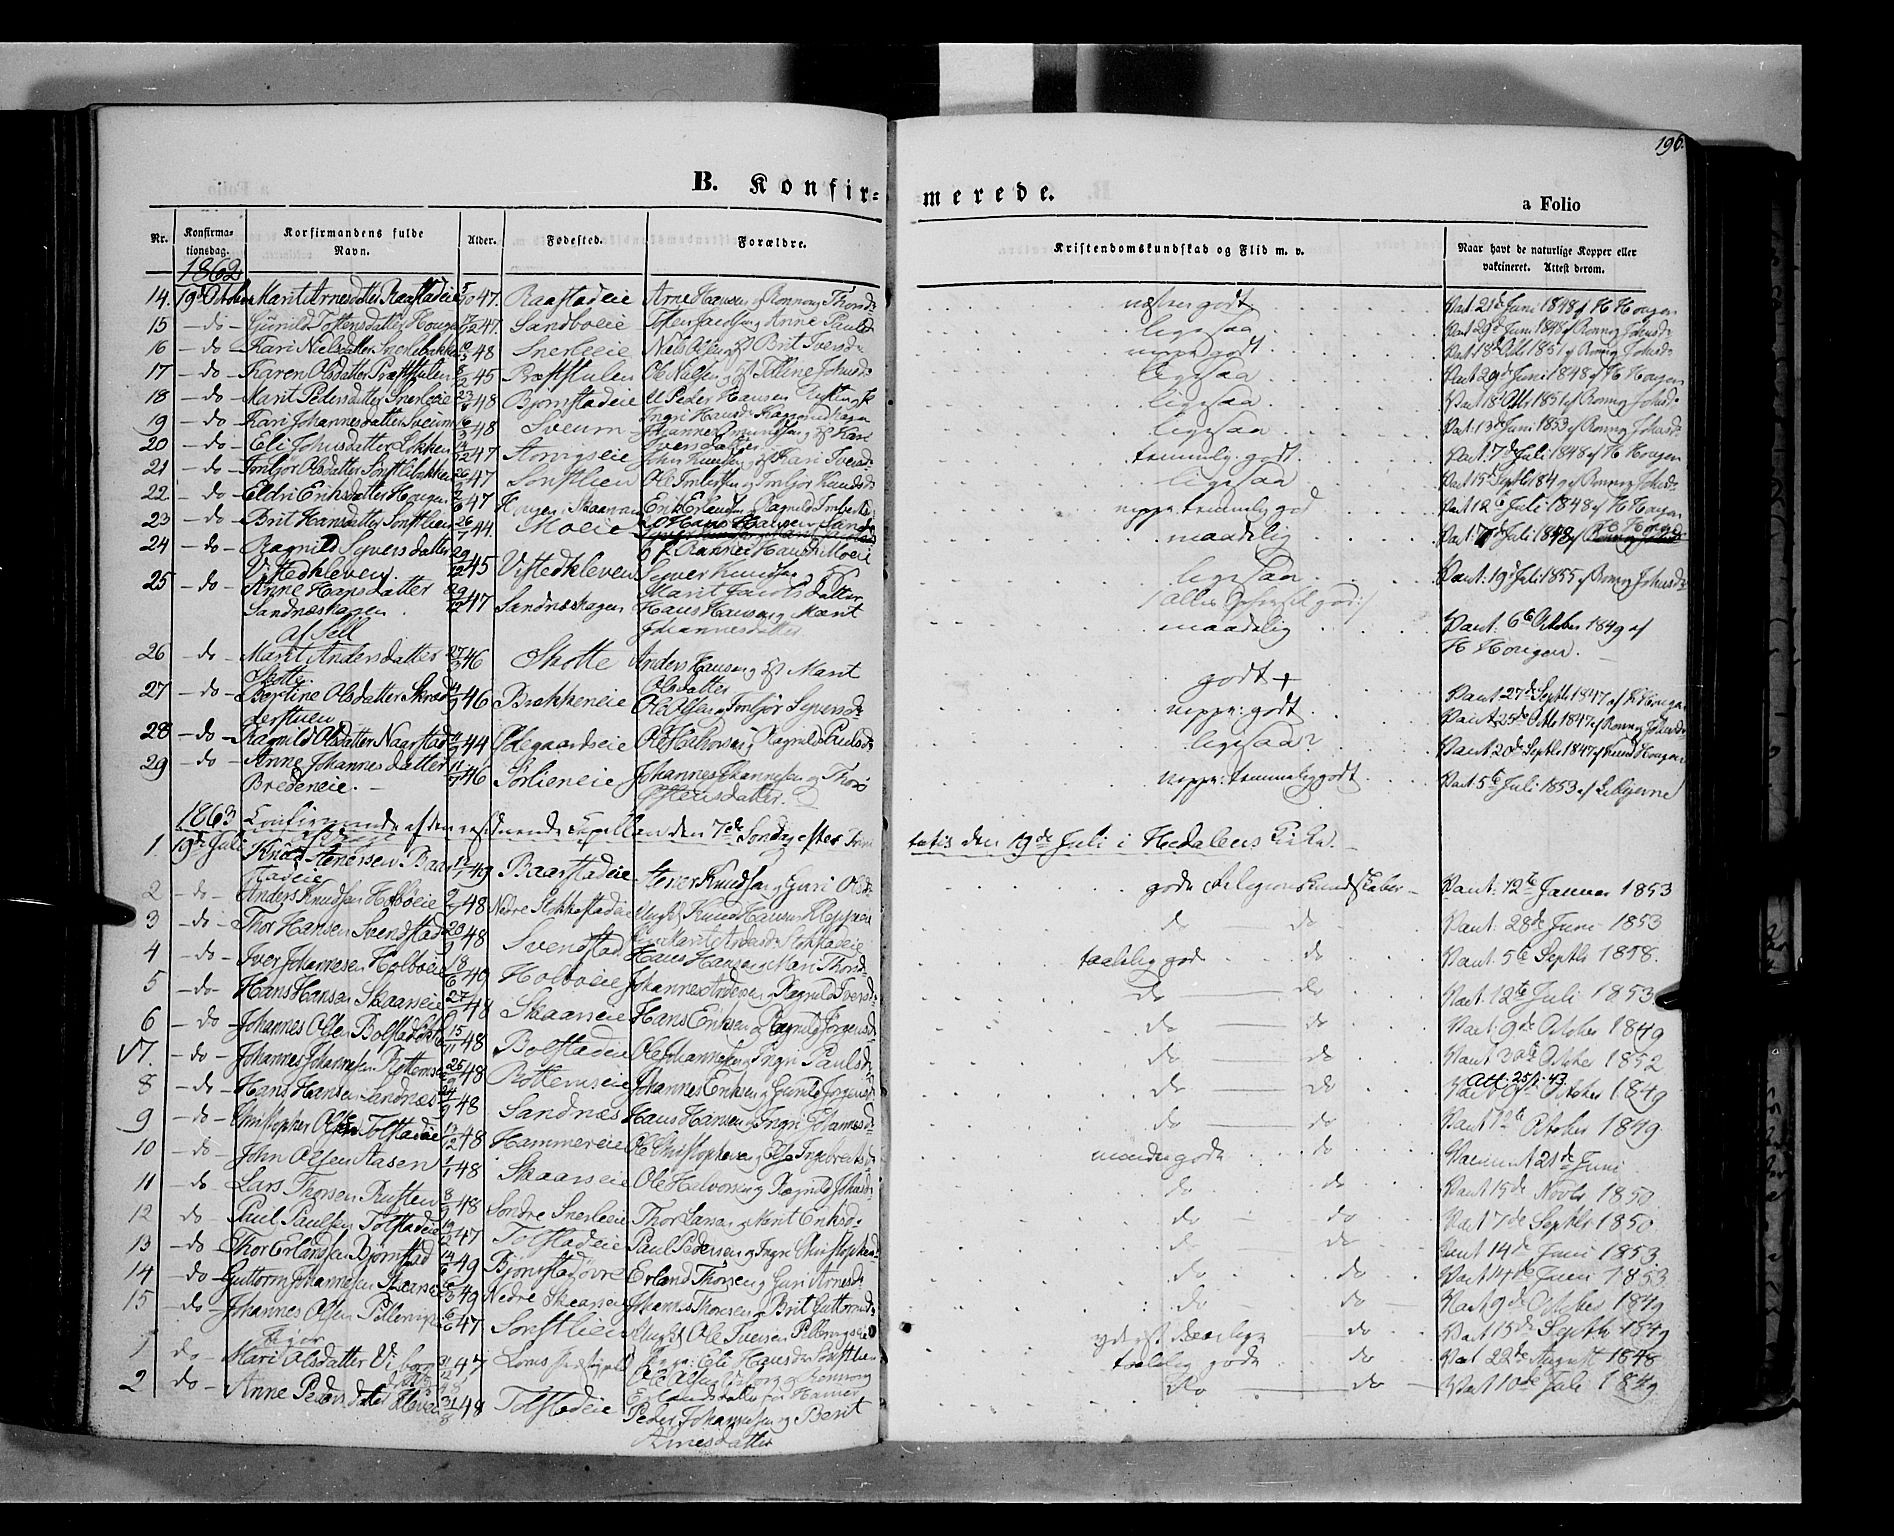 SAH, Vågå prestekontor, Ministerialbok nr. 6 /1, 1856-1872, s. 196